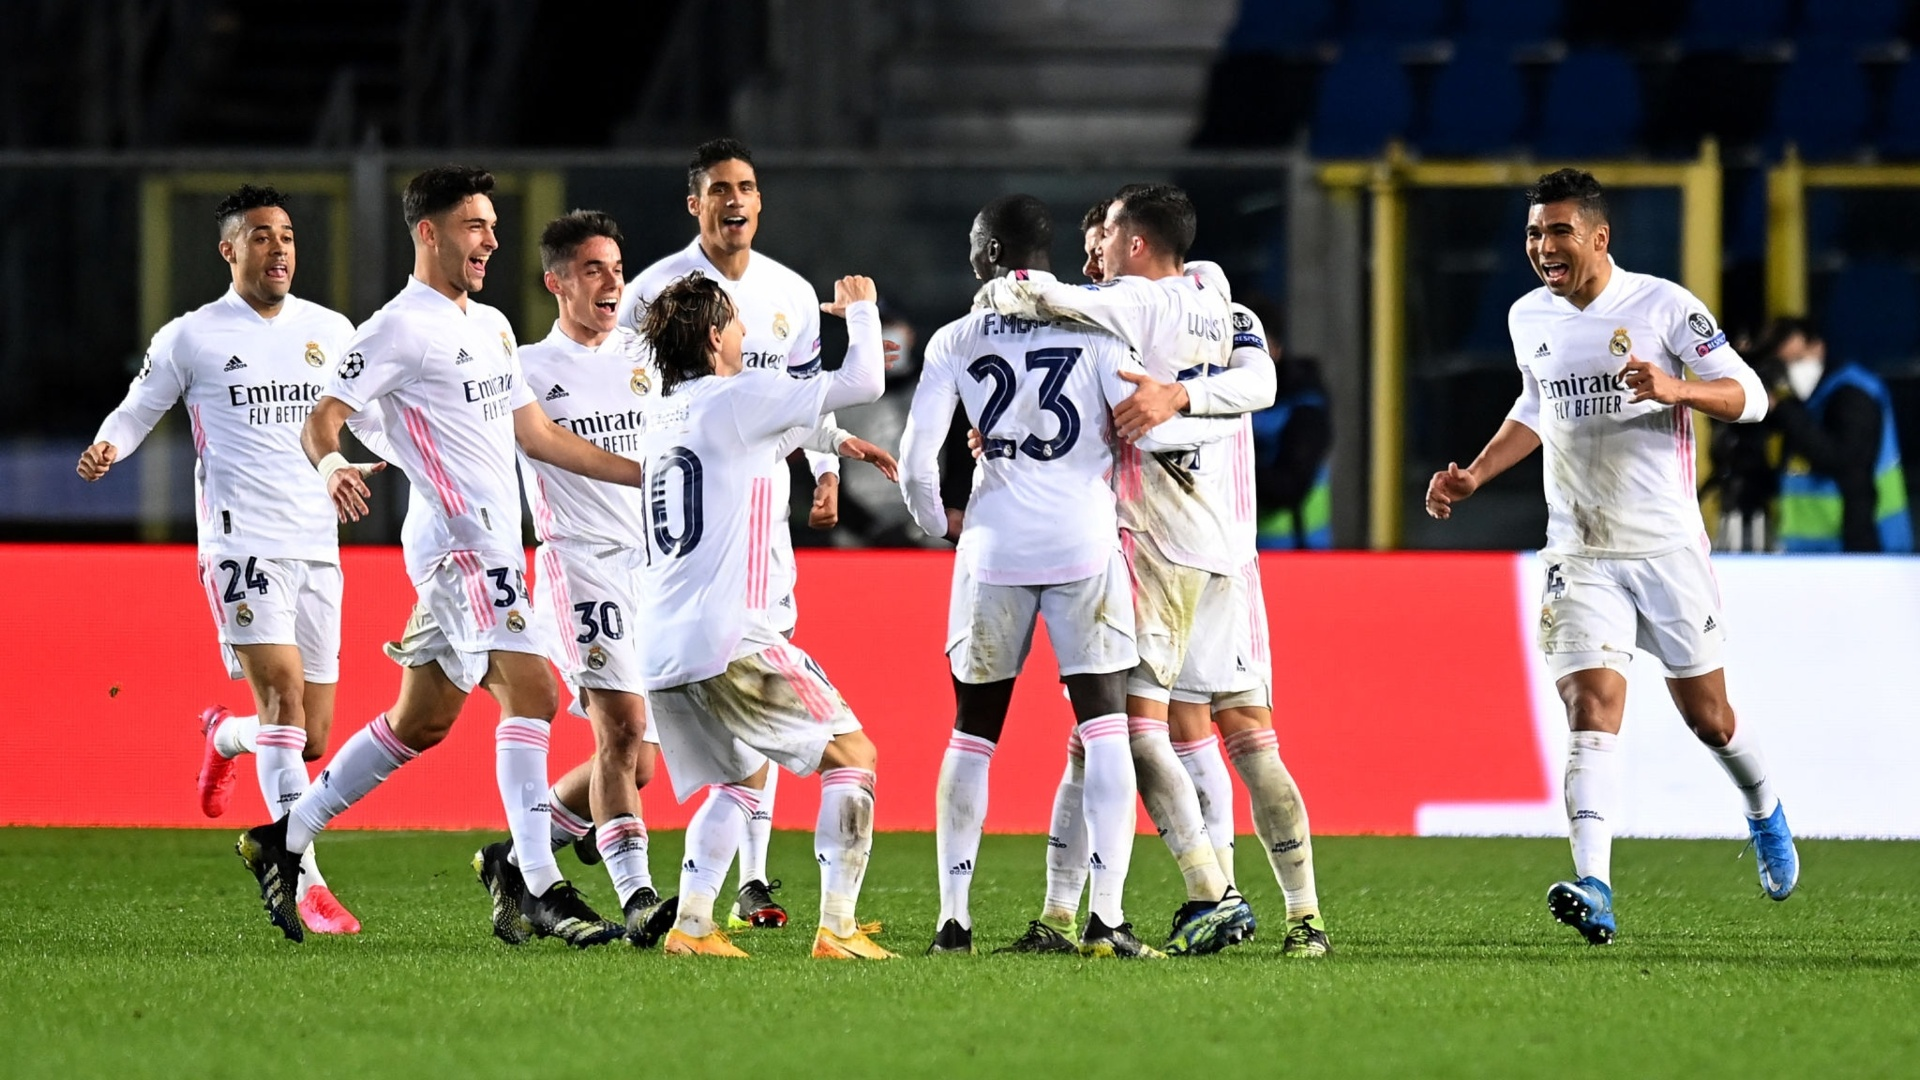 Match Report: Atalanta B.C. 0-1 Real Madrid